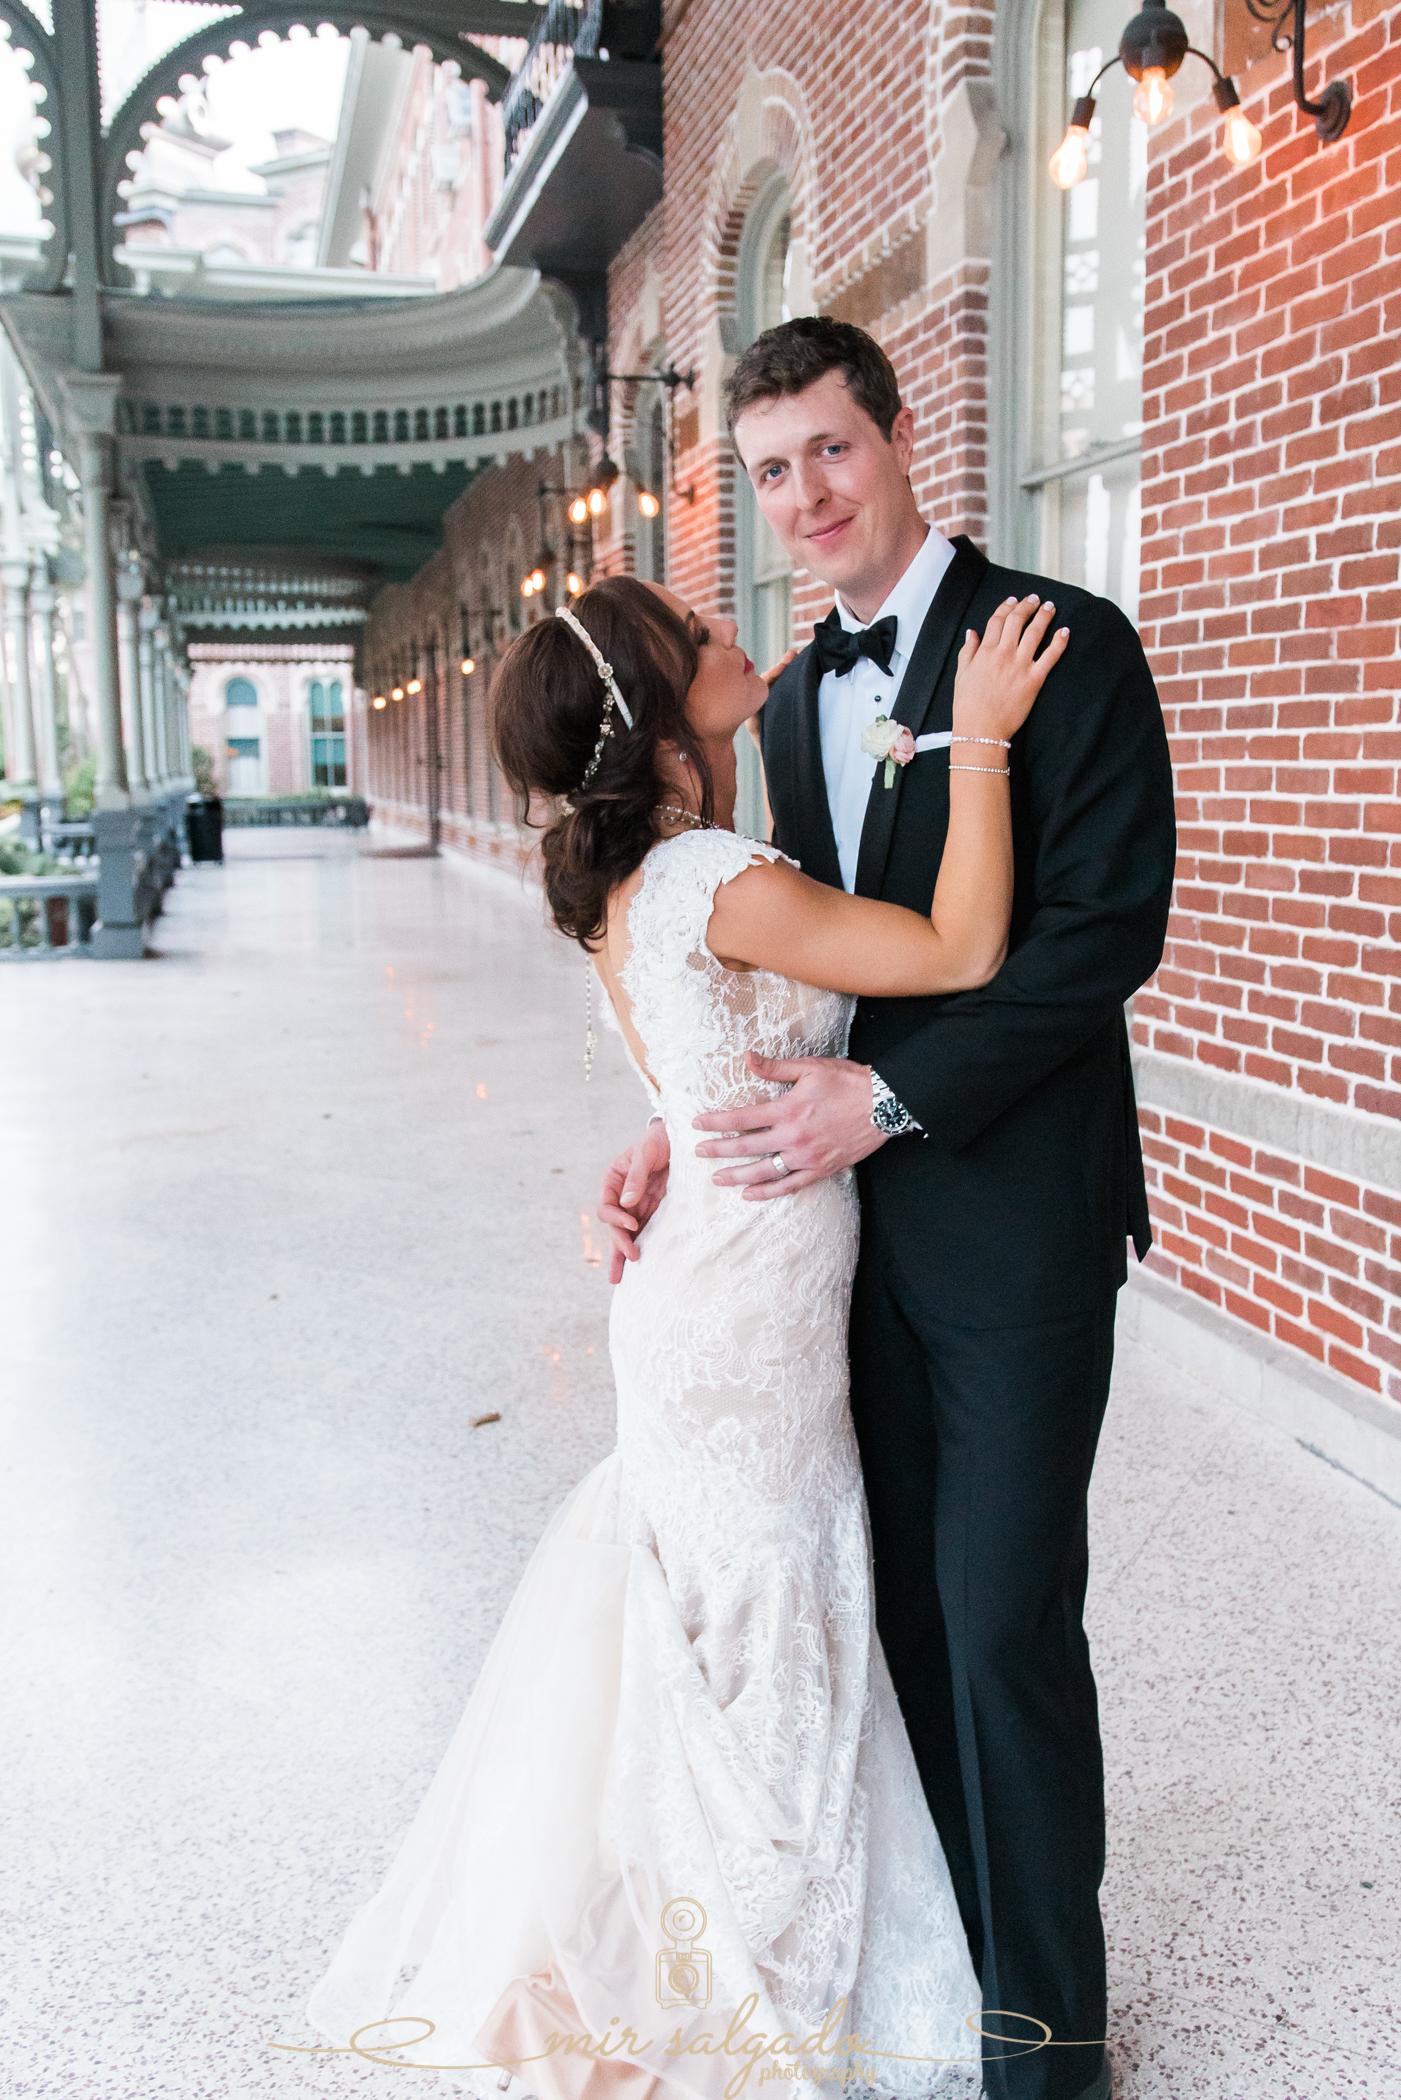 University-of-Tampa-wedding-photo, Tampa-wedding-photo